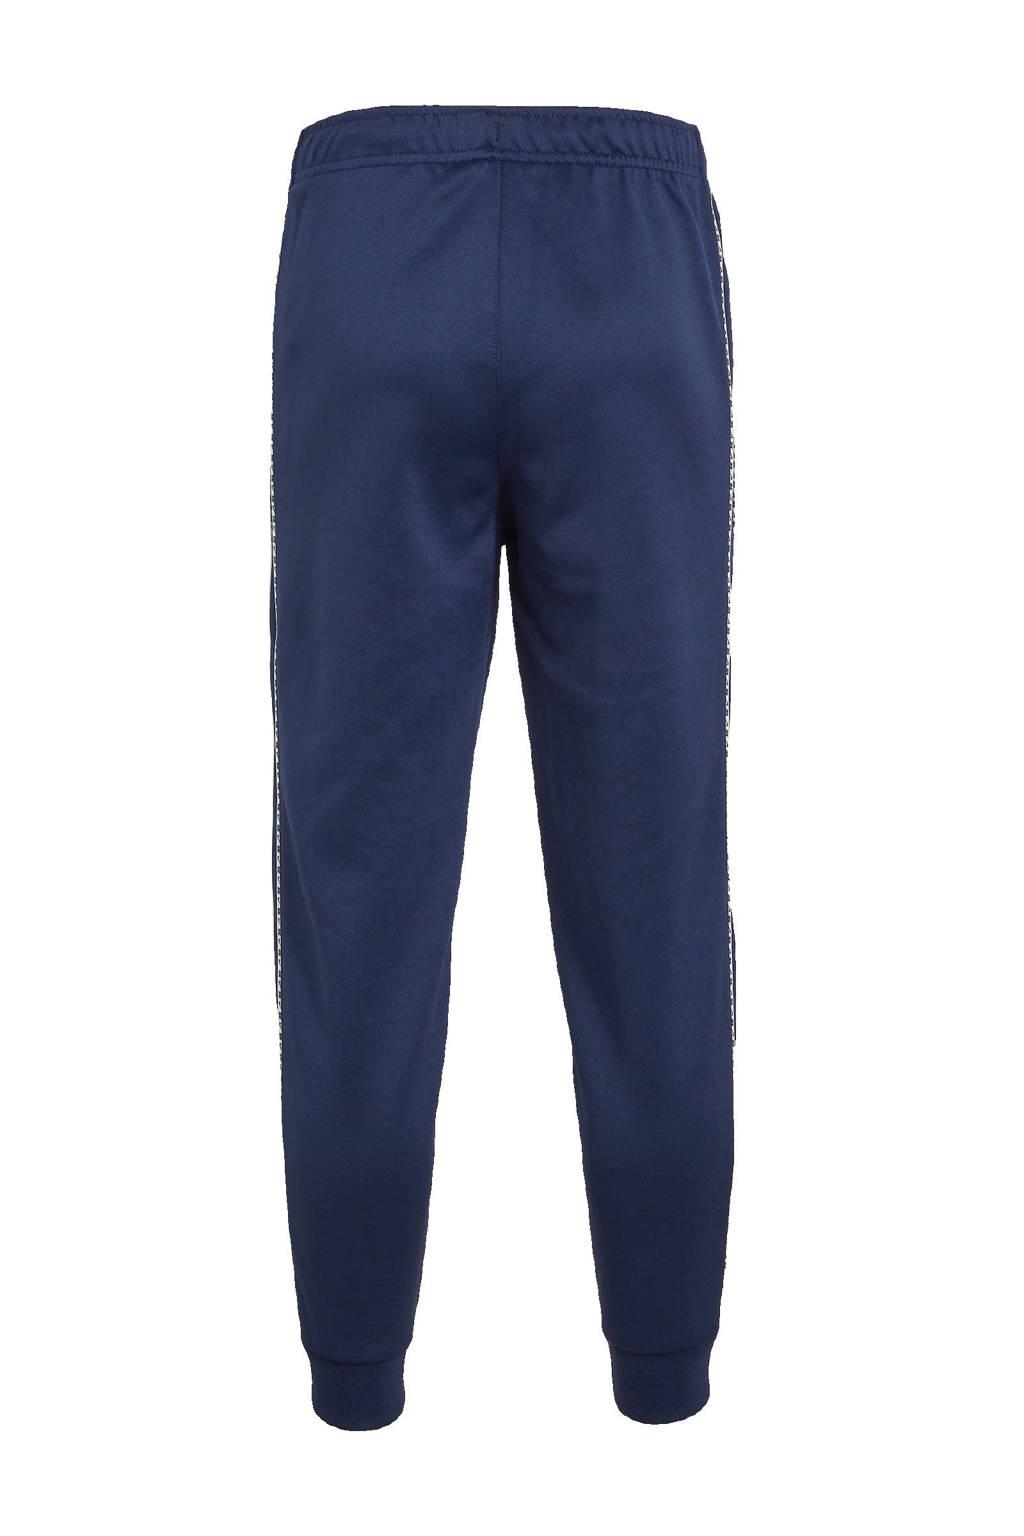 Nike joggingbroek donkerblauw/wit, Donkerblauw/wit